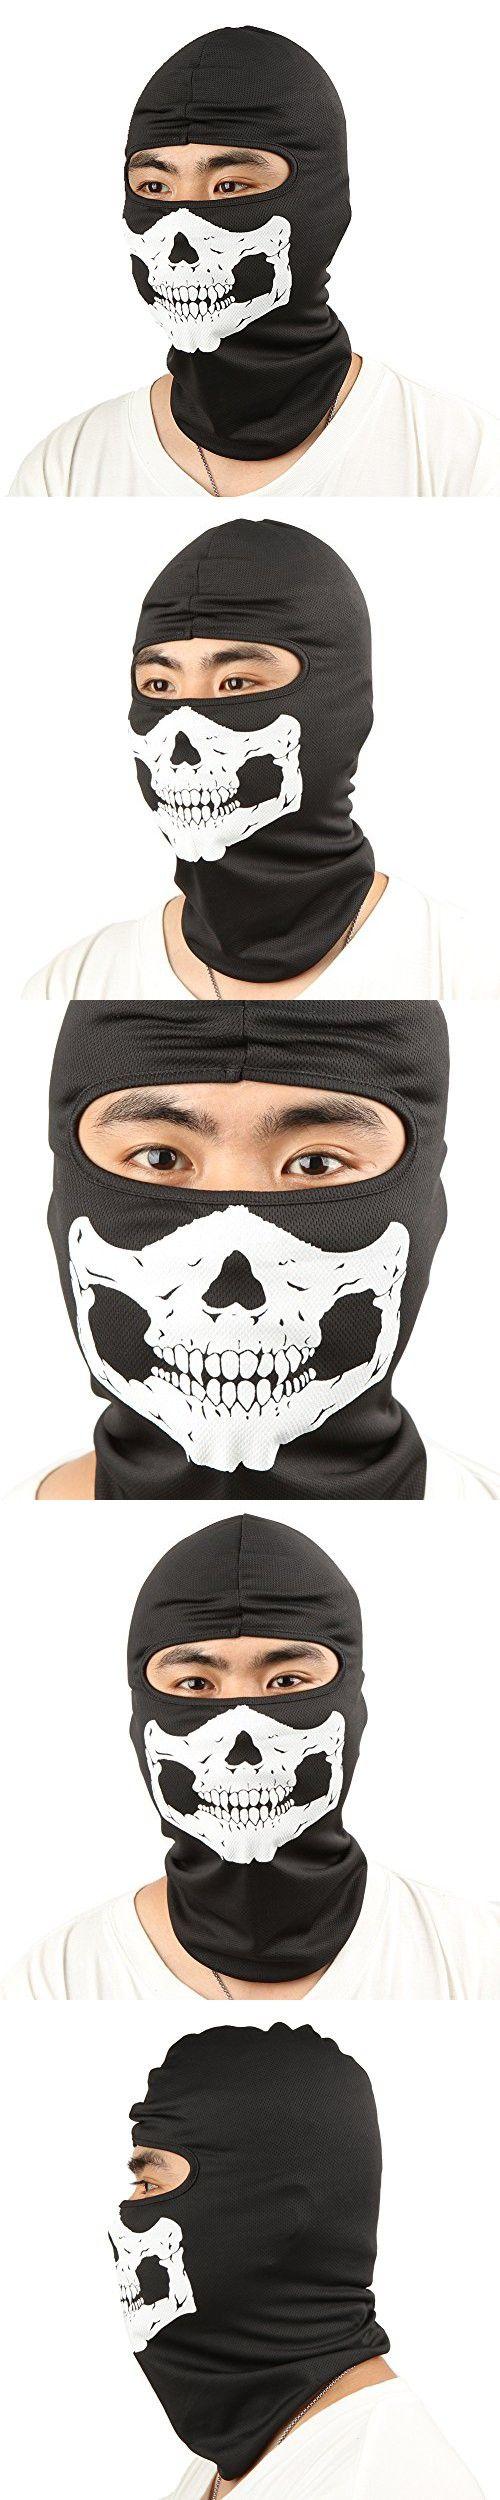 Best 25+ Biker mask ideas only on Pinterest | Atv news, News sites ...